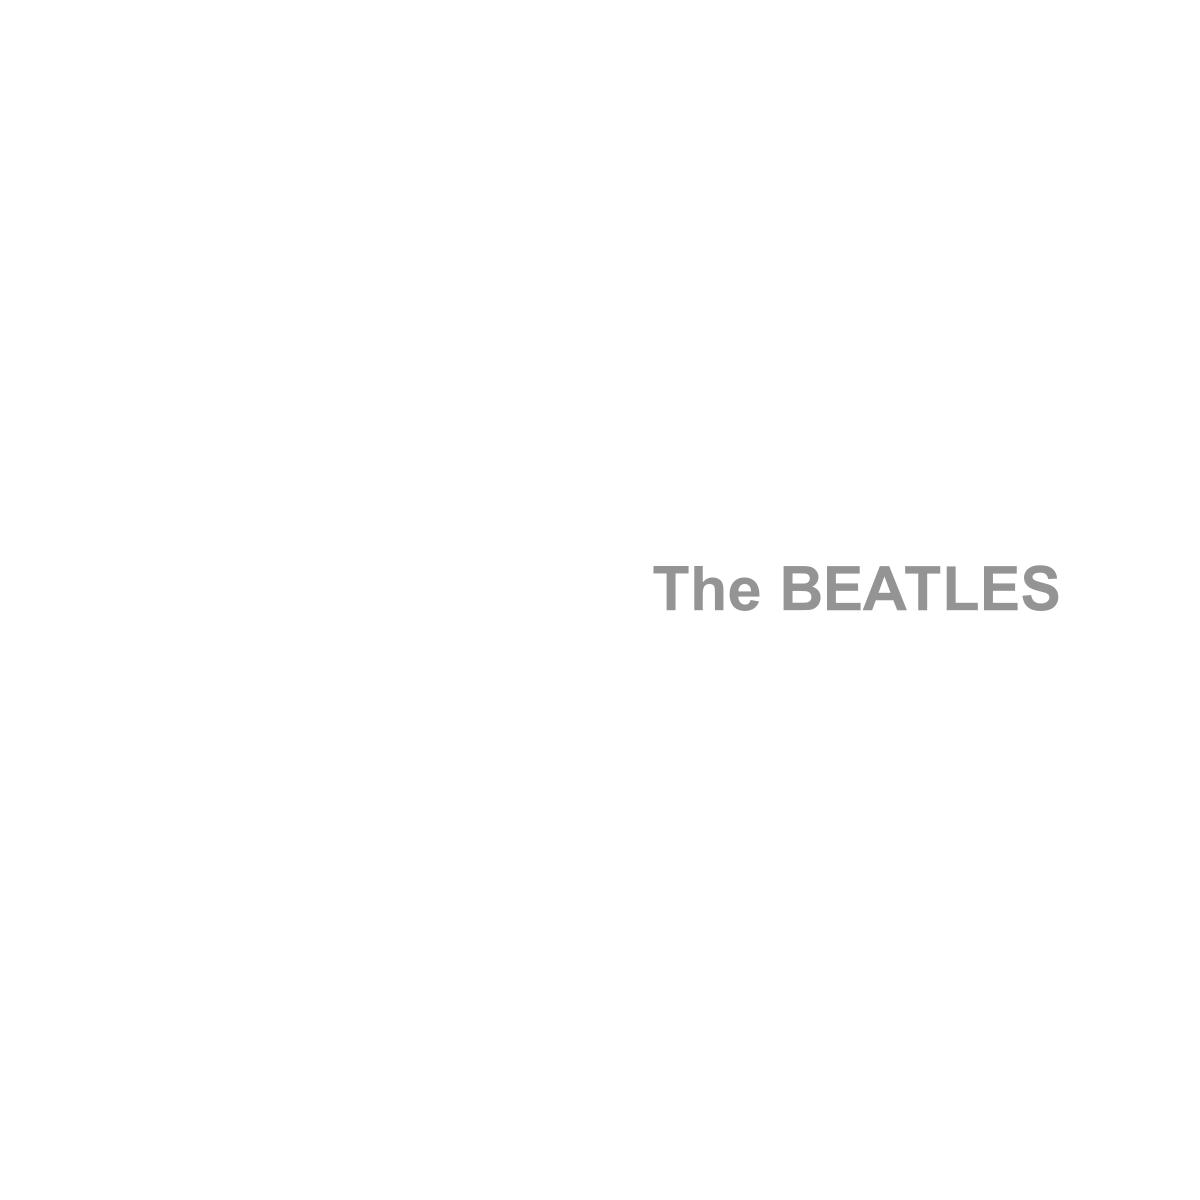 Pin By Fakepancake On A R T Izm Beatles White Album Beatles Albums Beatles Album Covers